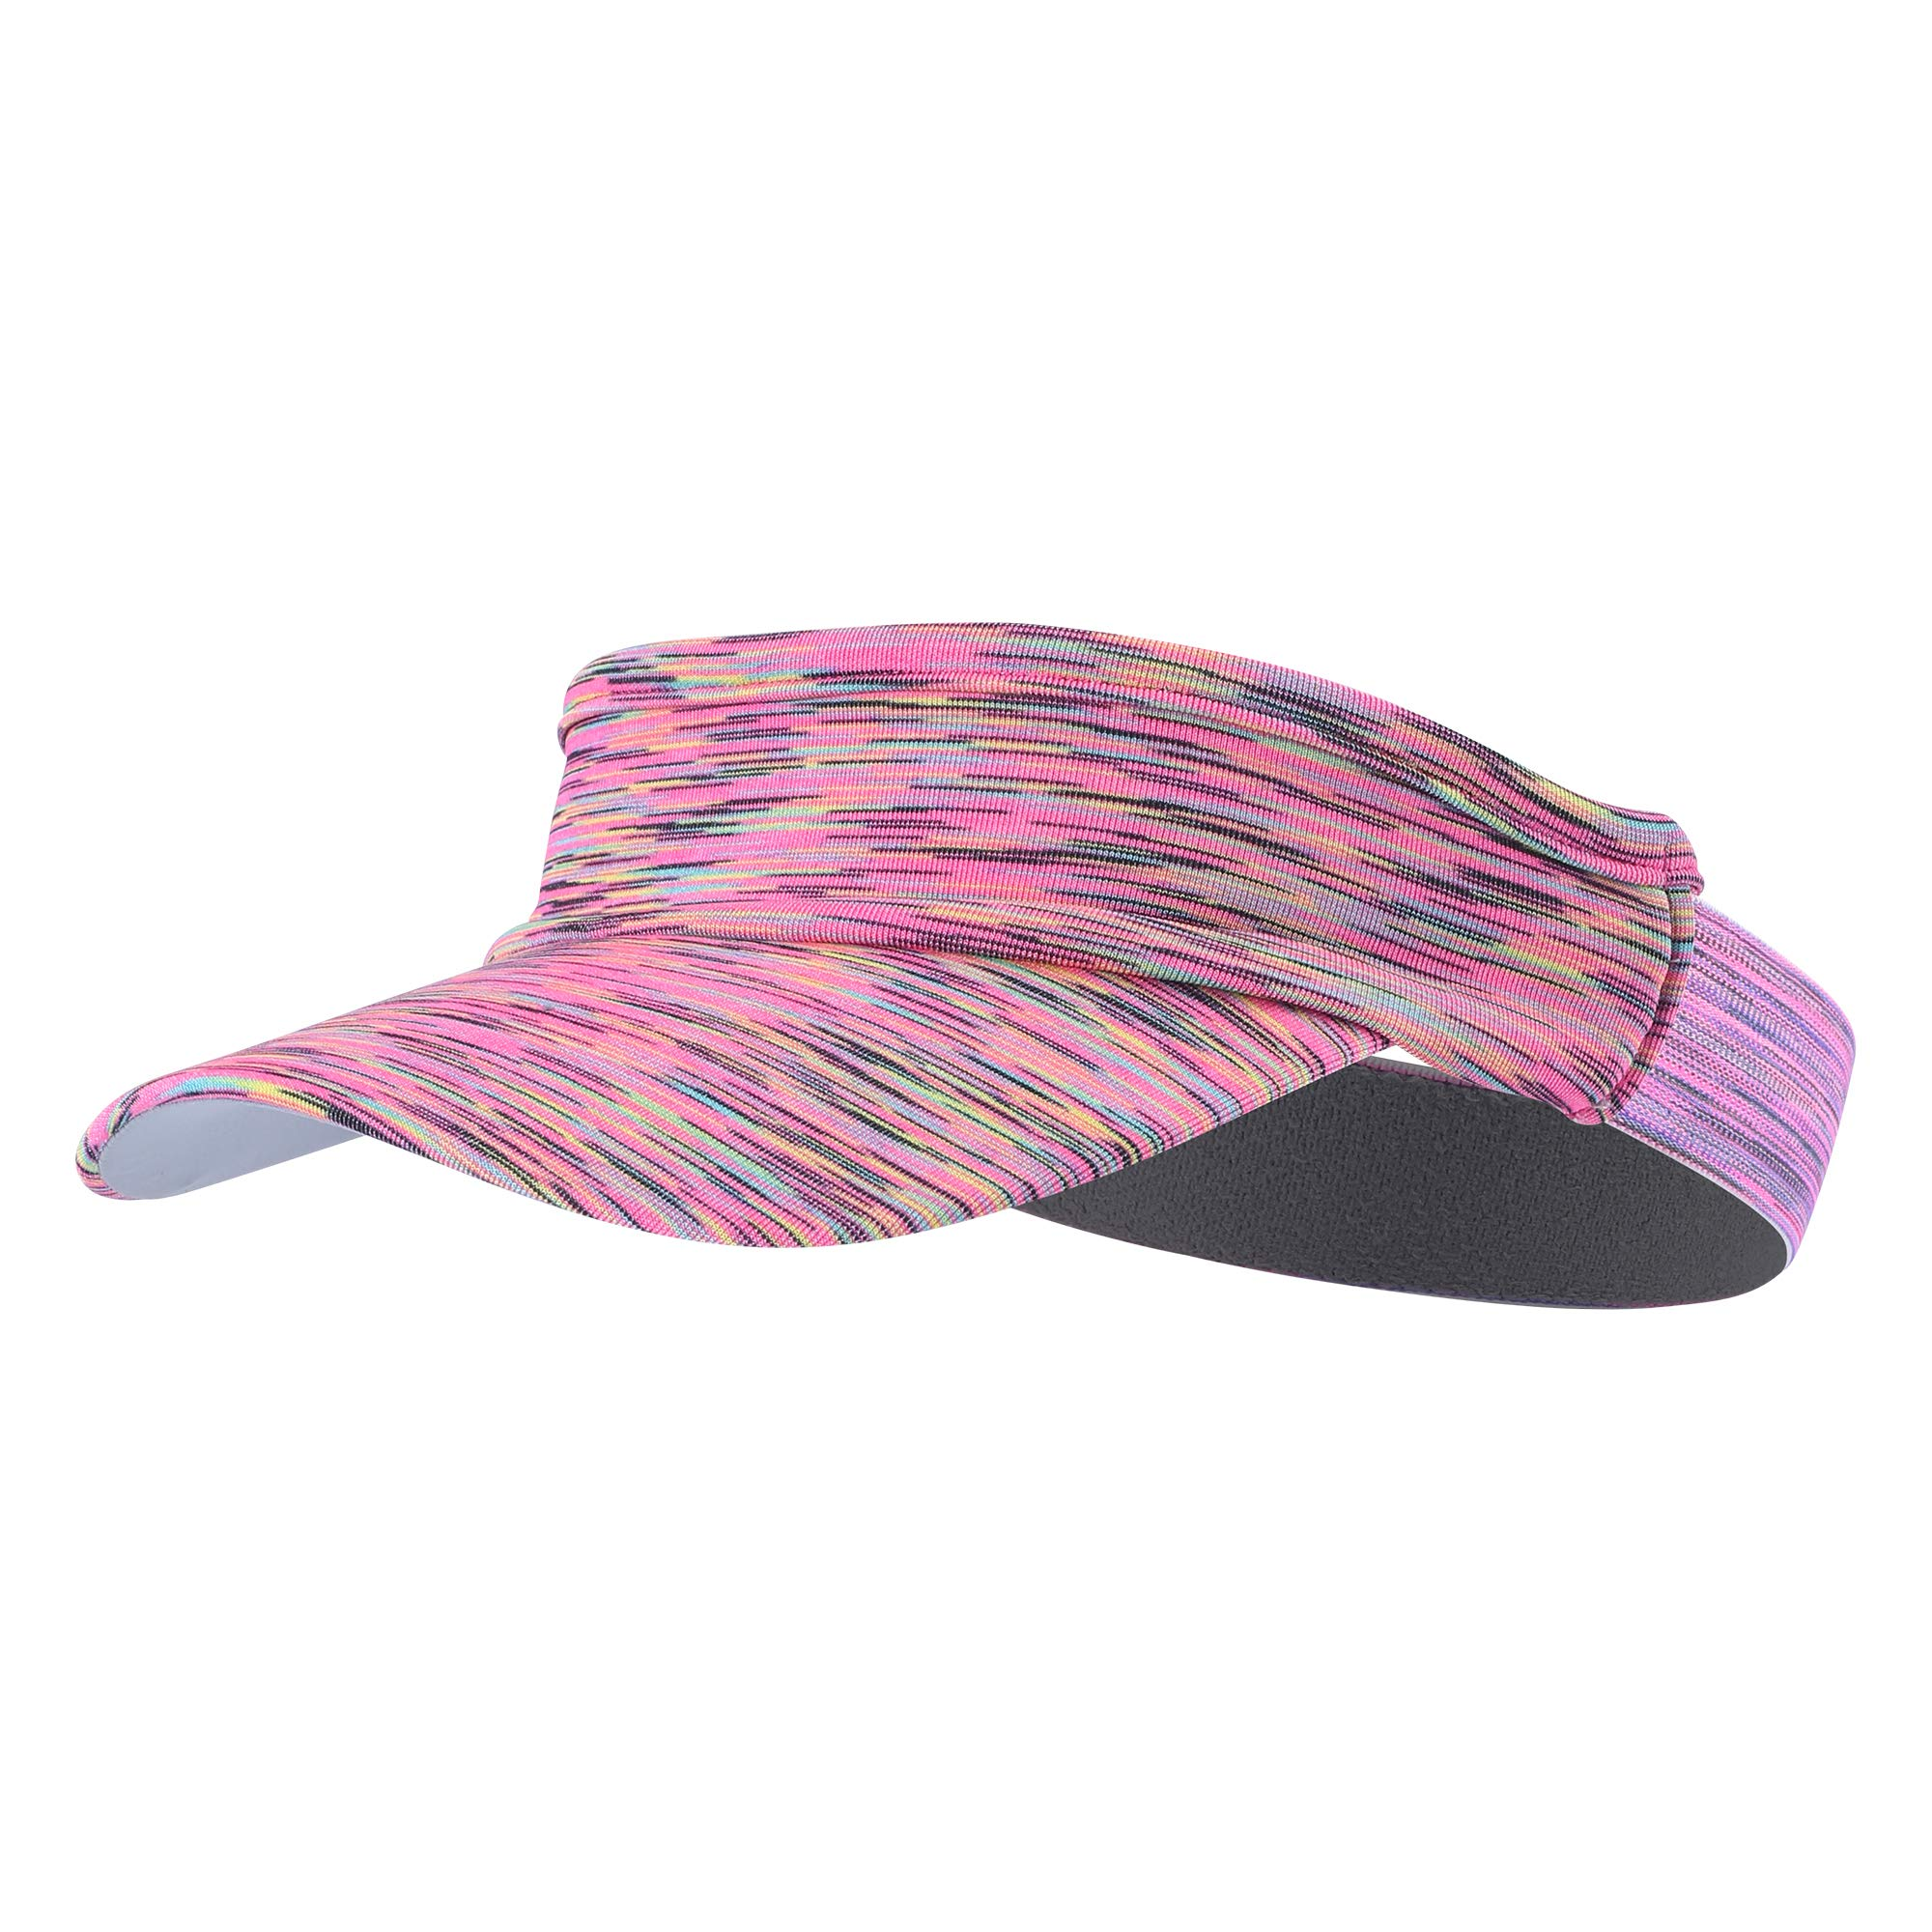 TEFITI Sun Visor Hat for Women Men, Adjustable Sports Hat for Golf Tennis Cycling Running Jogging